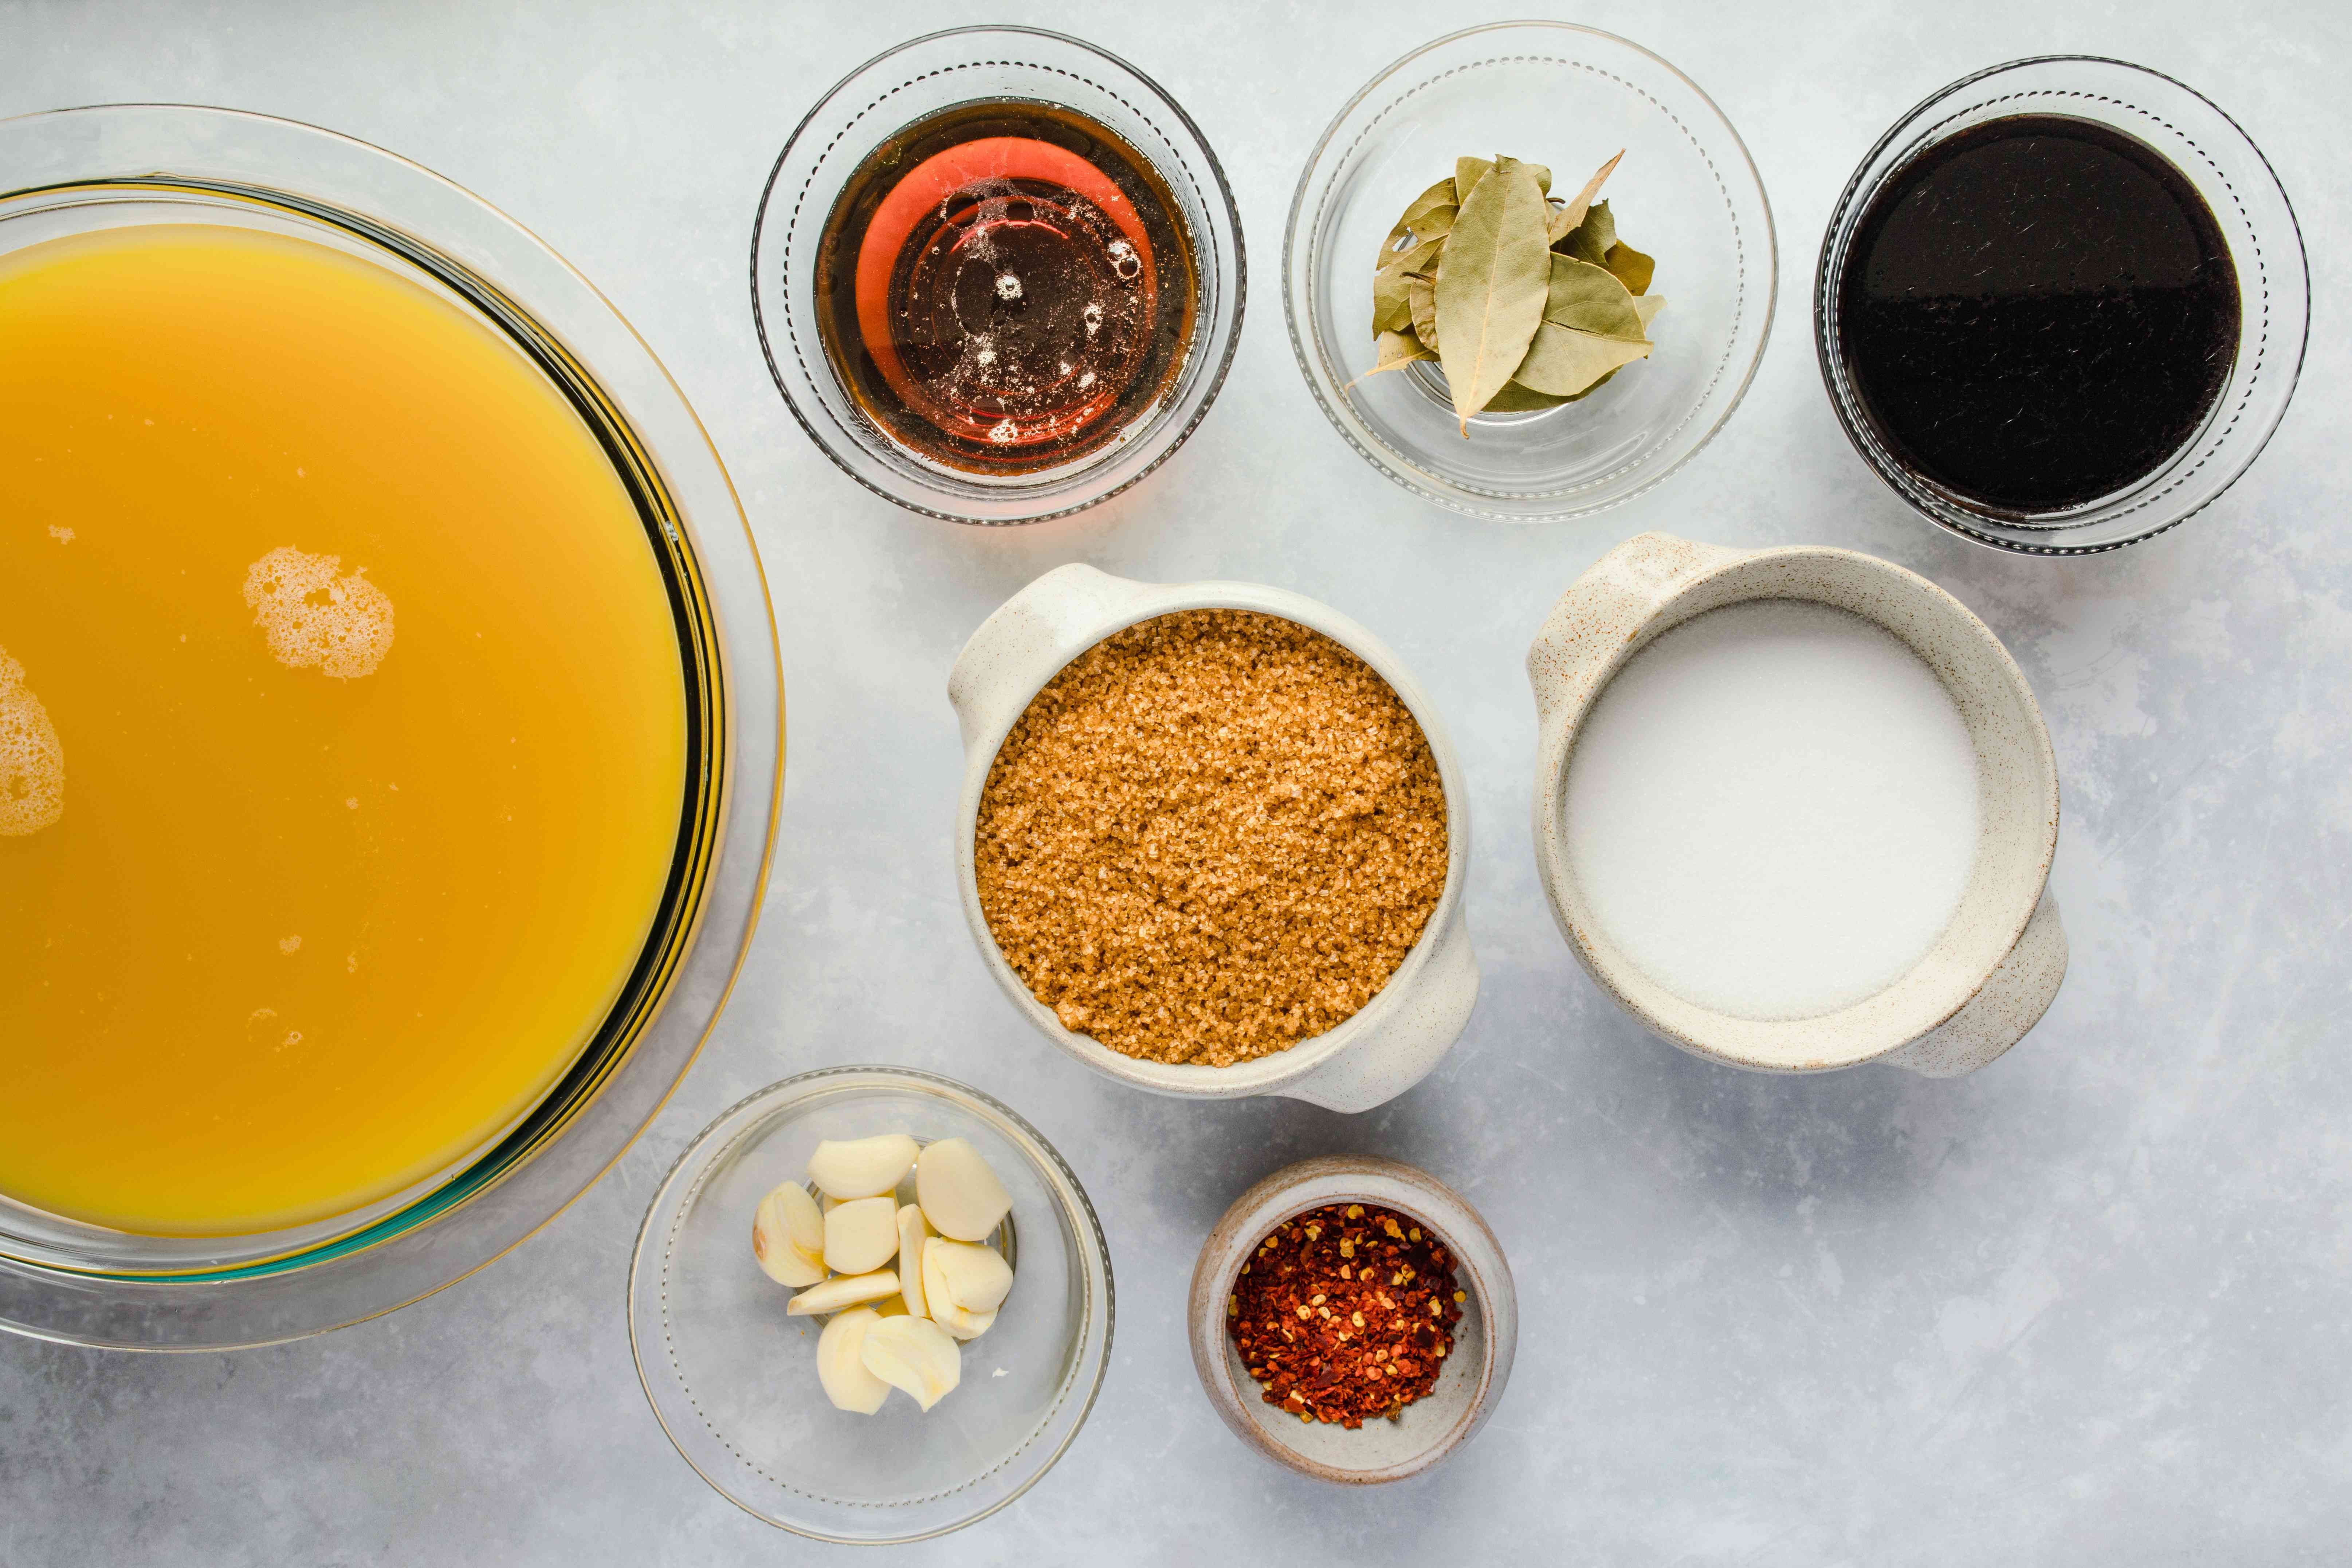 Ingredients for Hawaiian style turkey brine